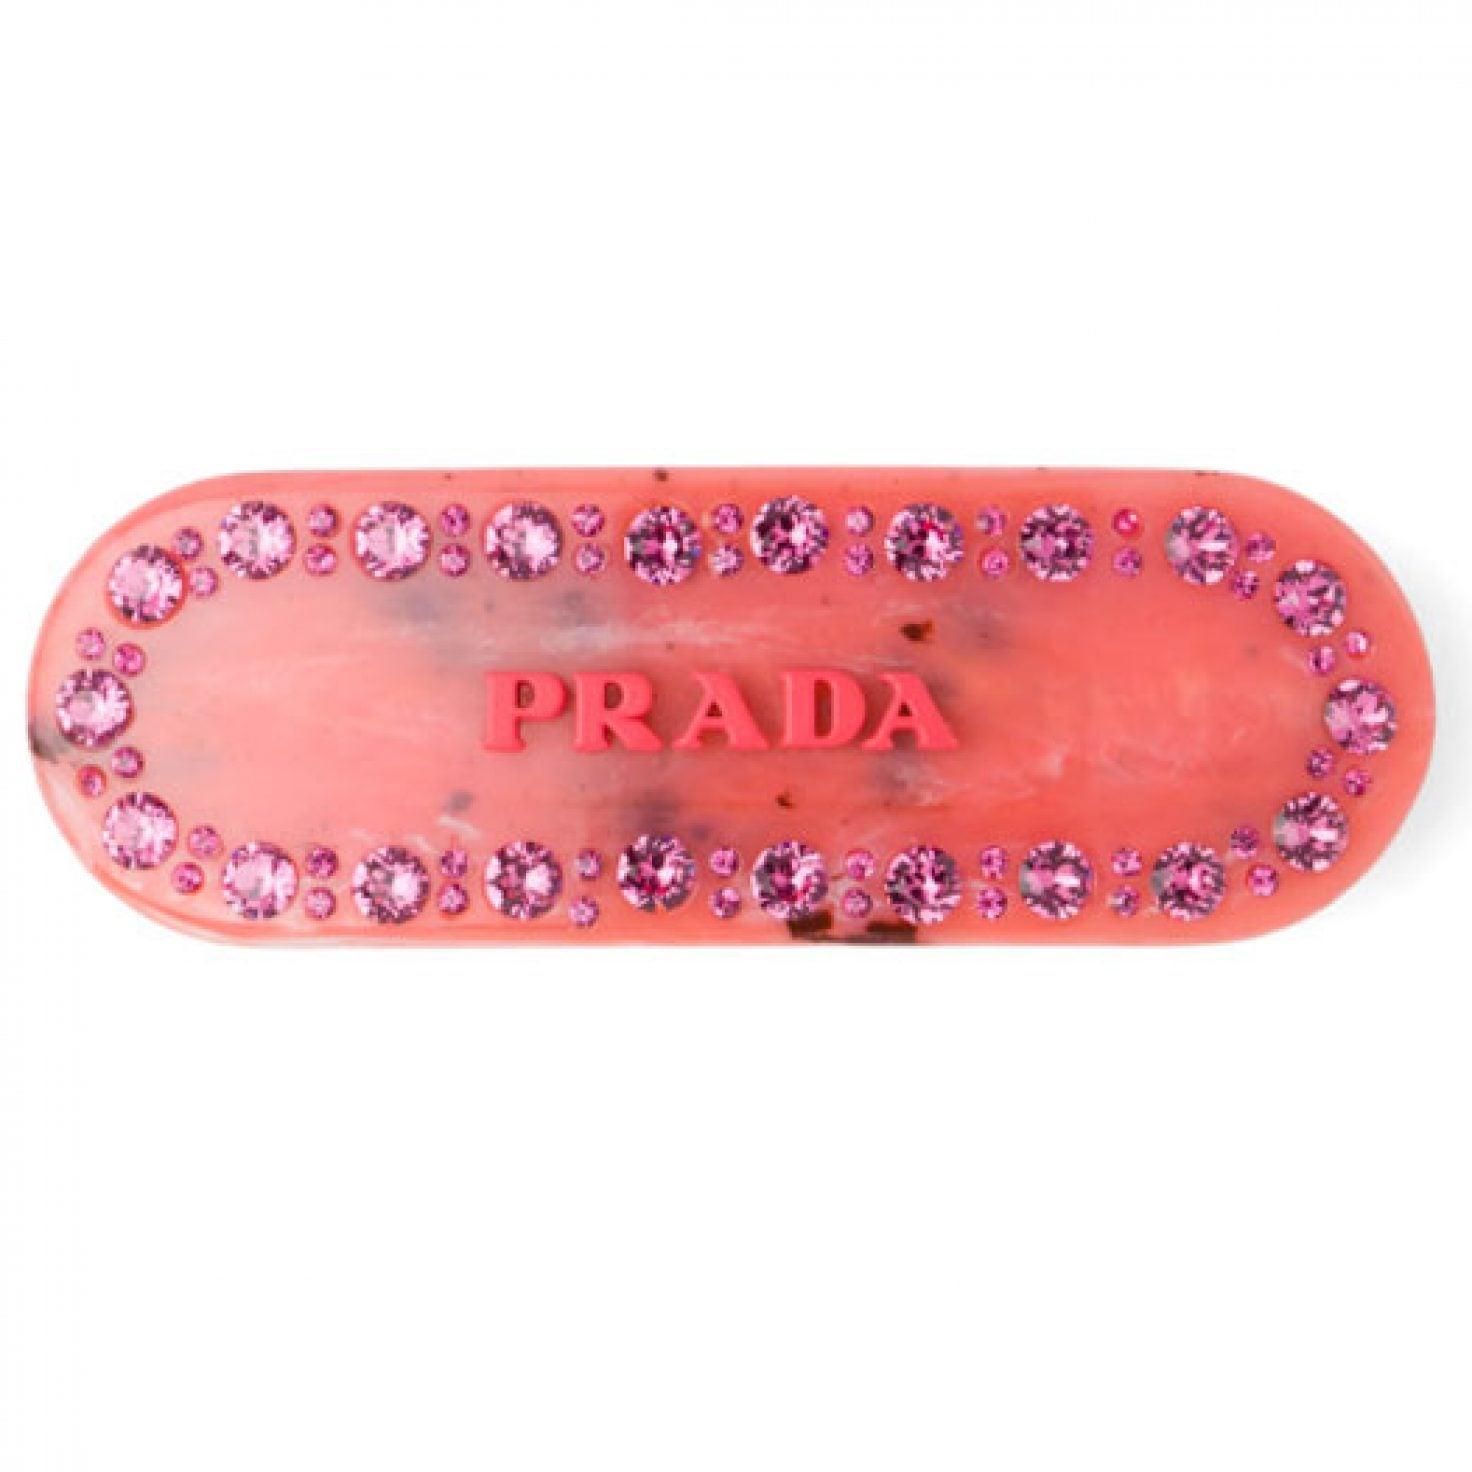 Editors Pick: These New Prada Hair Clips Are So Dreamy